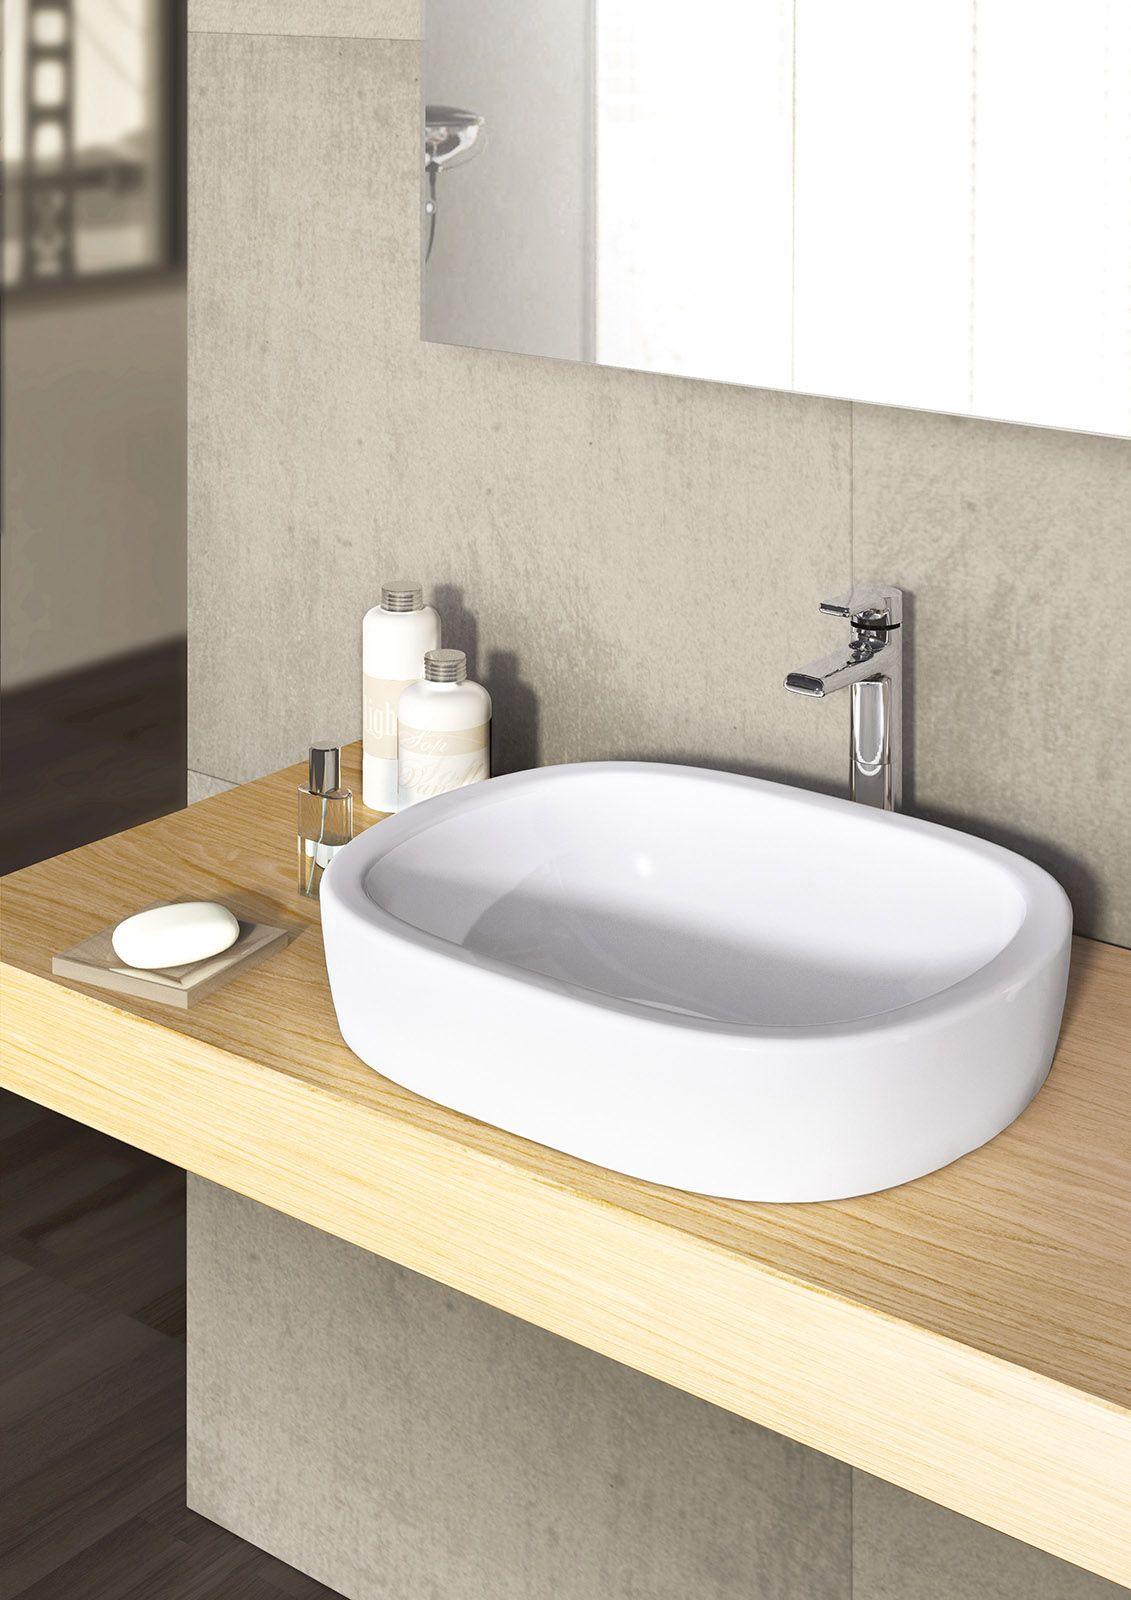 Lavabi Salvaspazio Poco Profondi Home Decor Home Magazine Design